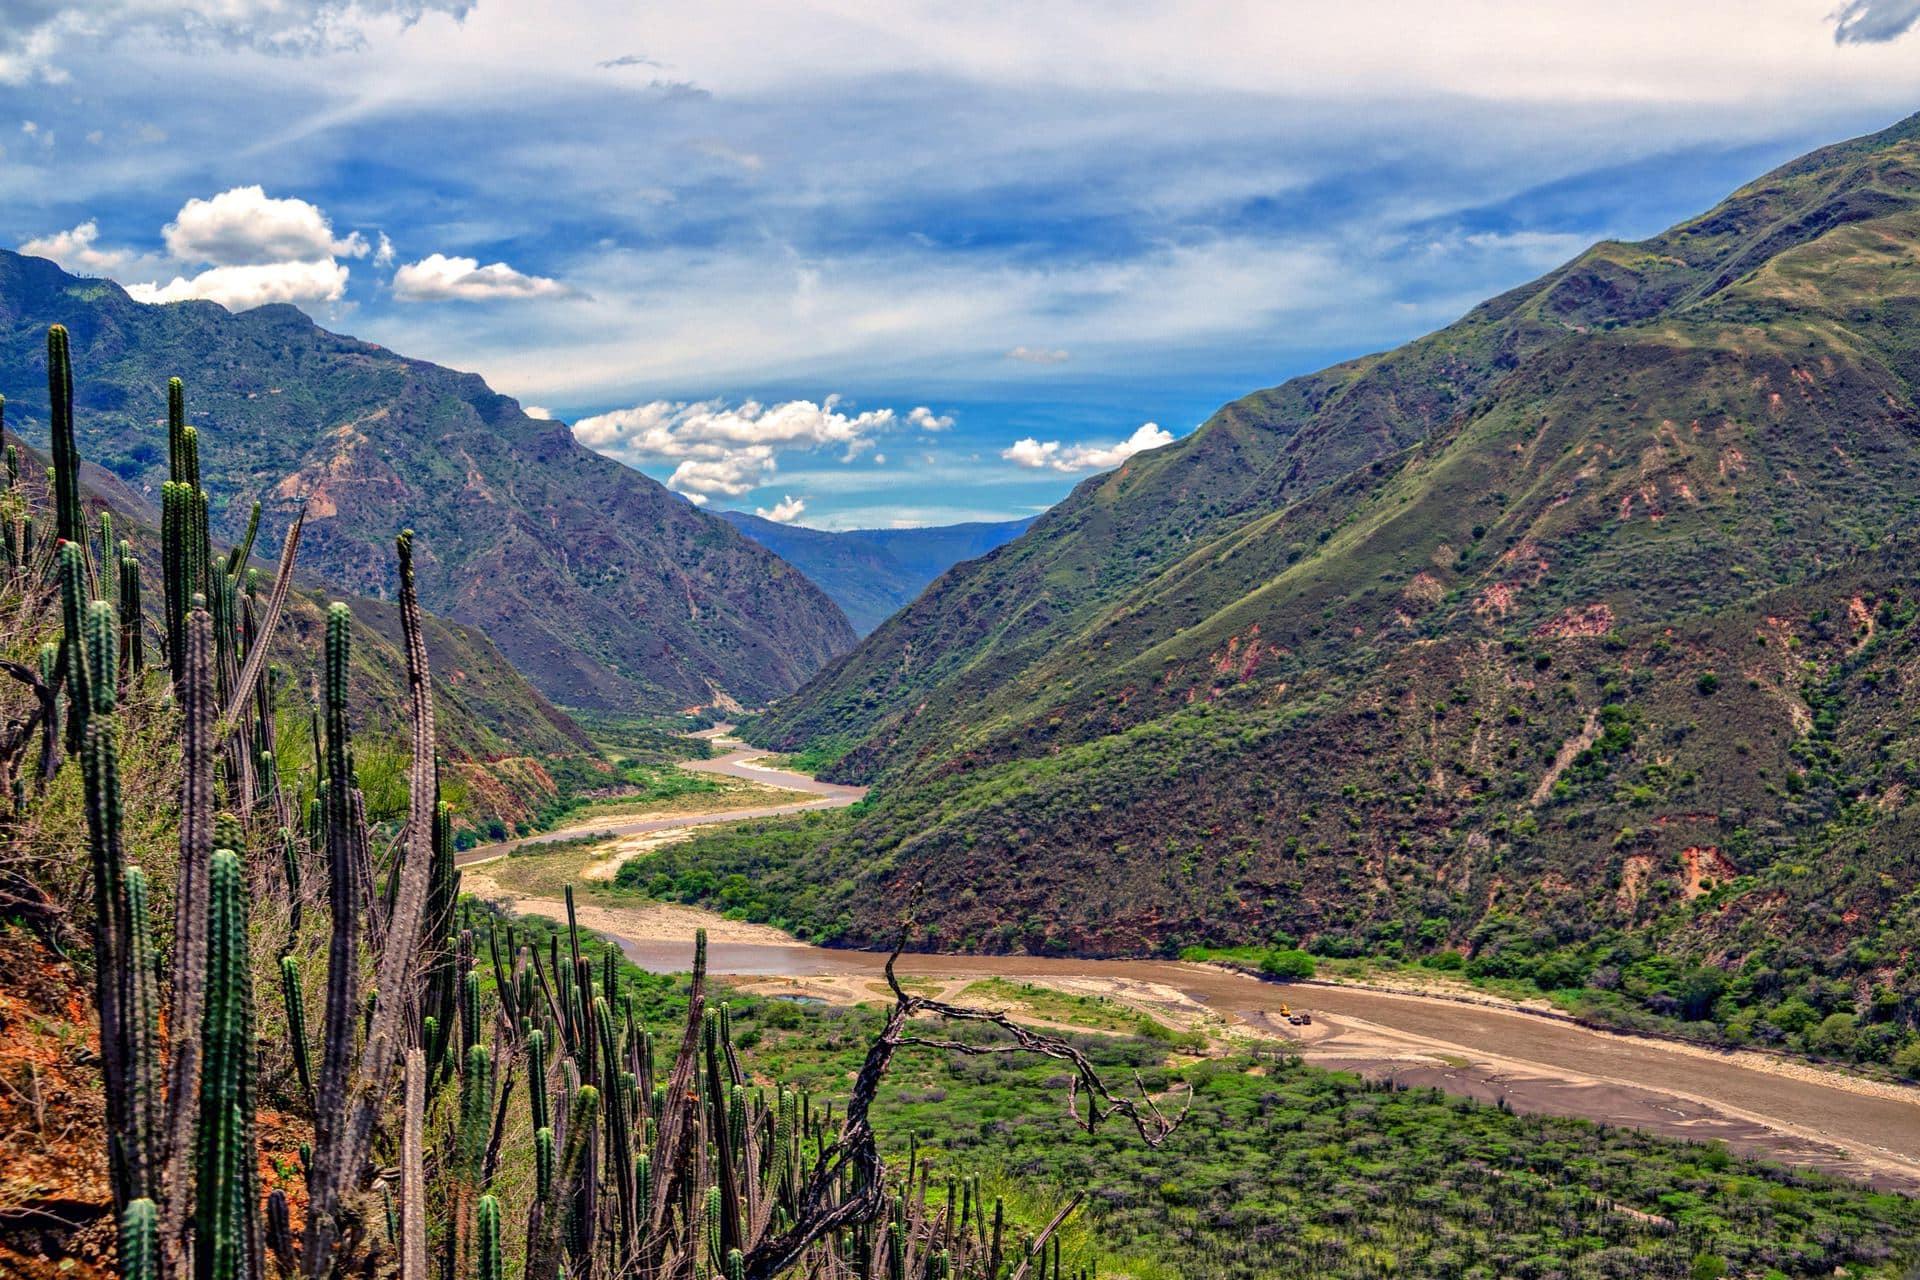 south america ultra marathon chicamocha canyon race